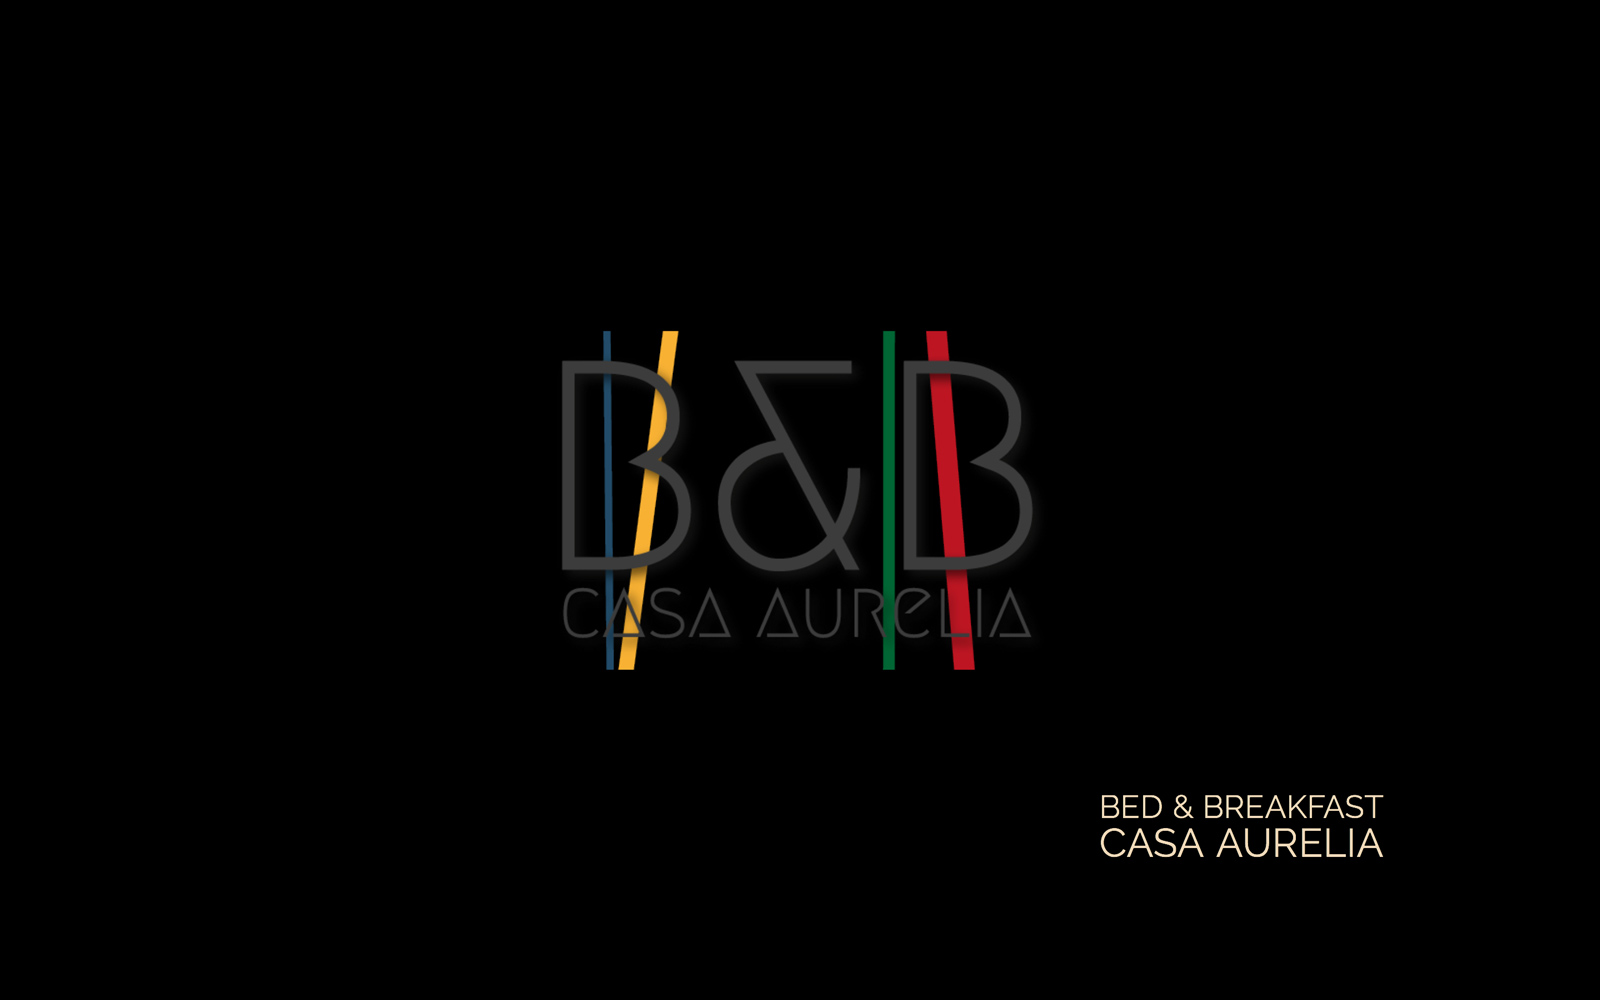 bed-&-Breakfast-Casa-Aurelia